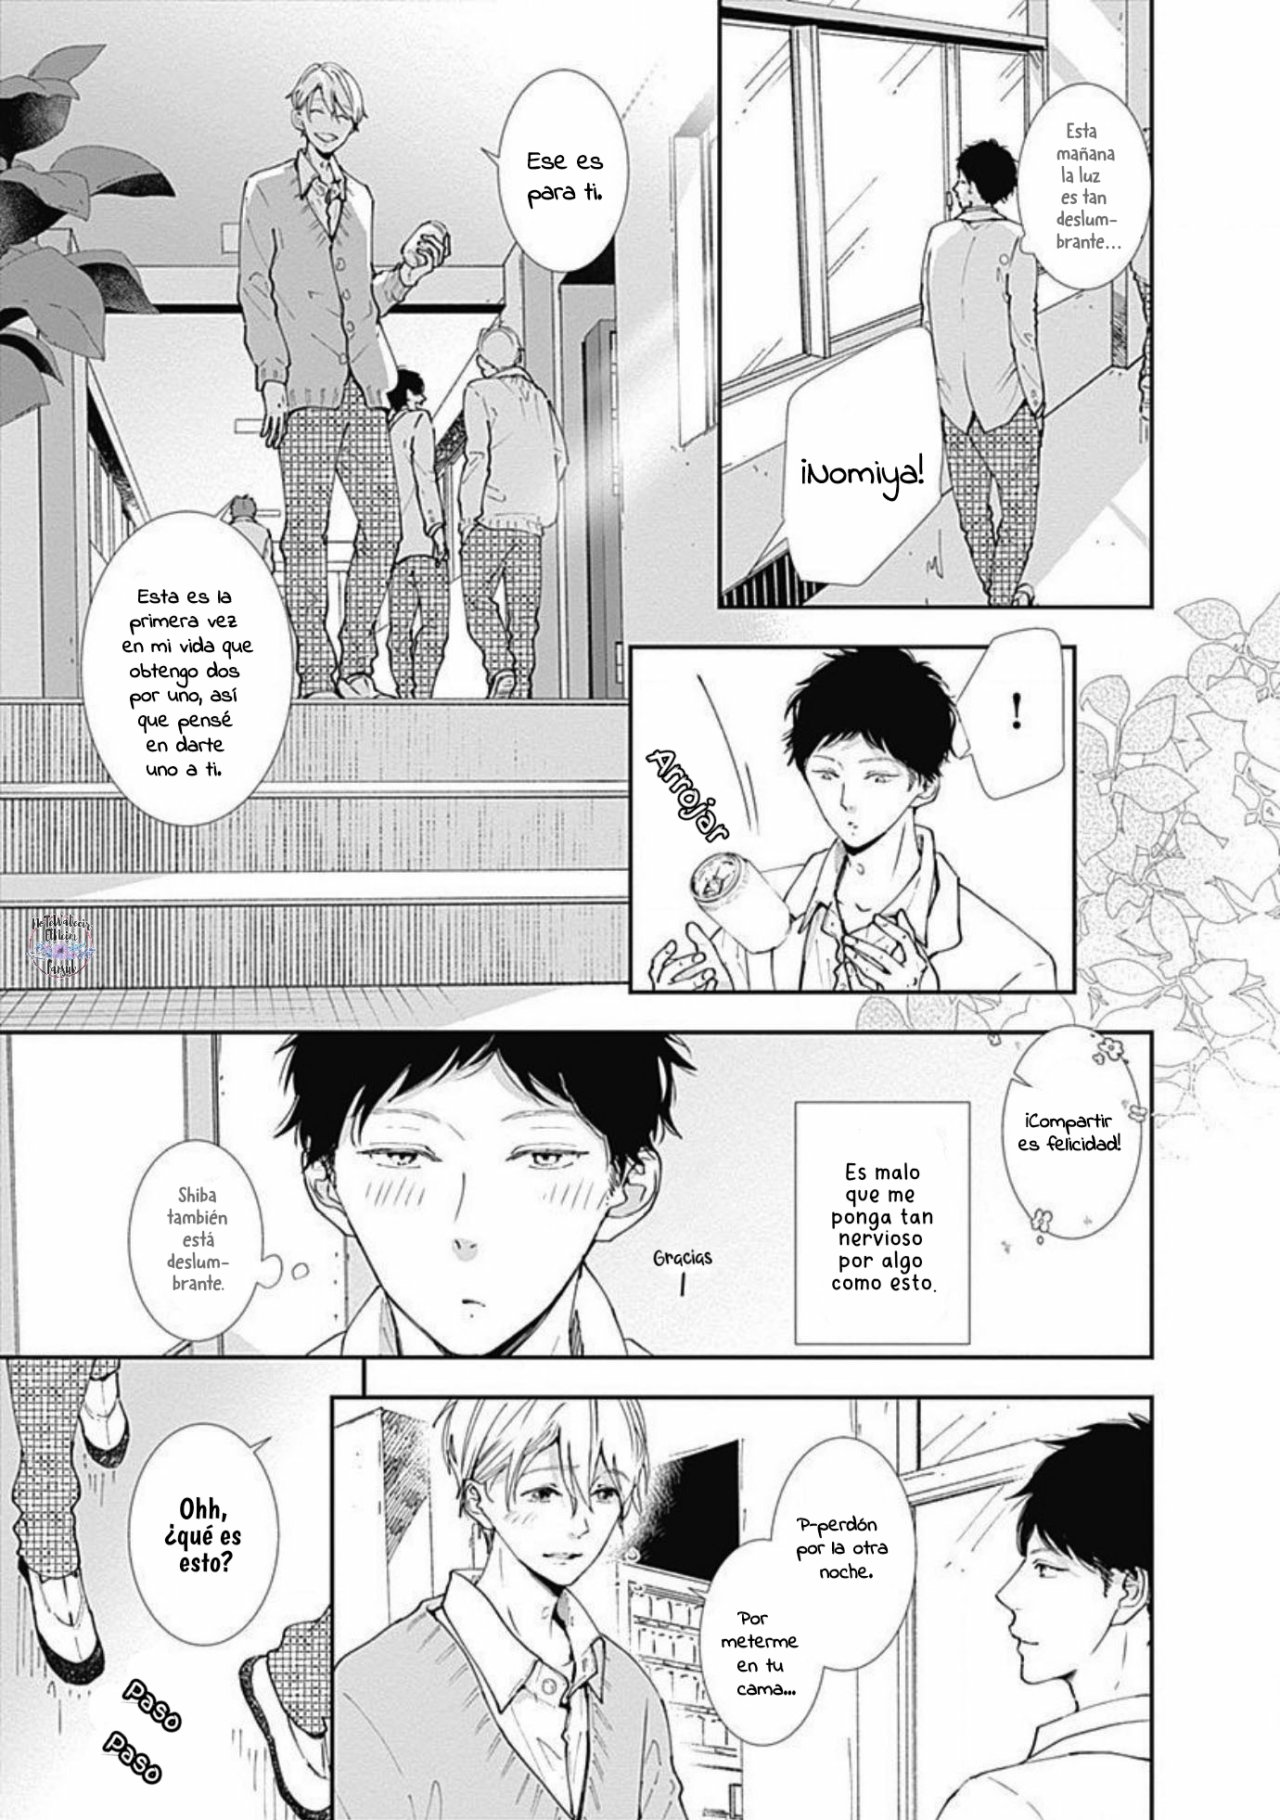 https://nine.mangadogs.com/es_manga/pic8/12/36684/946997/0ac9a79e4aa15b44845b6b553cfcddbd.jpg Page 12